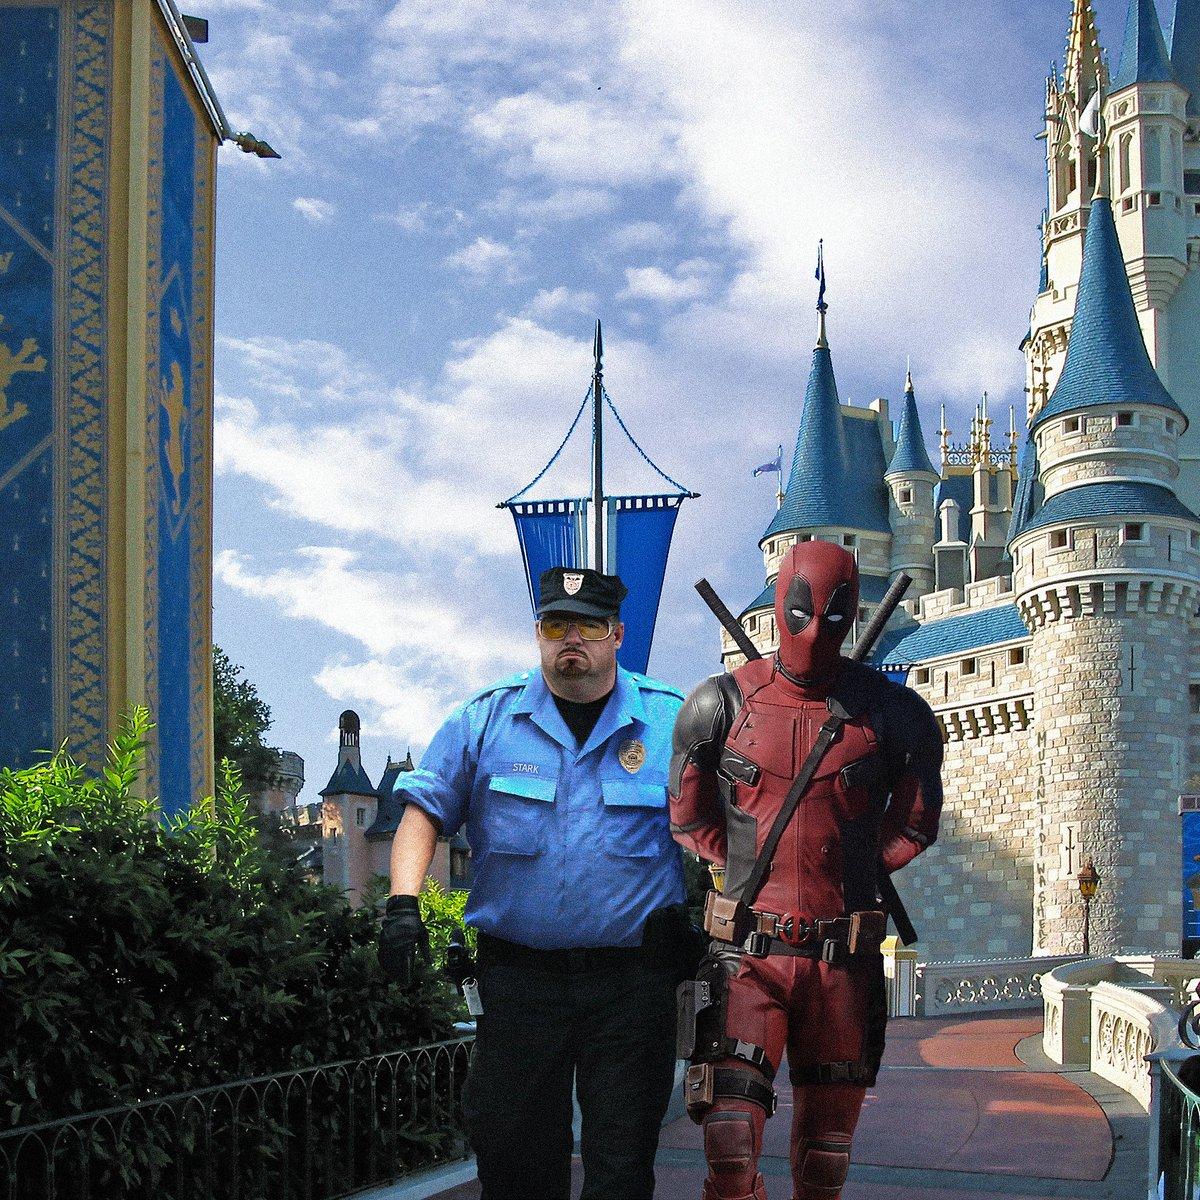 Ryan Reynolds (@VancityReynolds), @JamesGunn, and more react to the Disney-Fox mega-merger